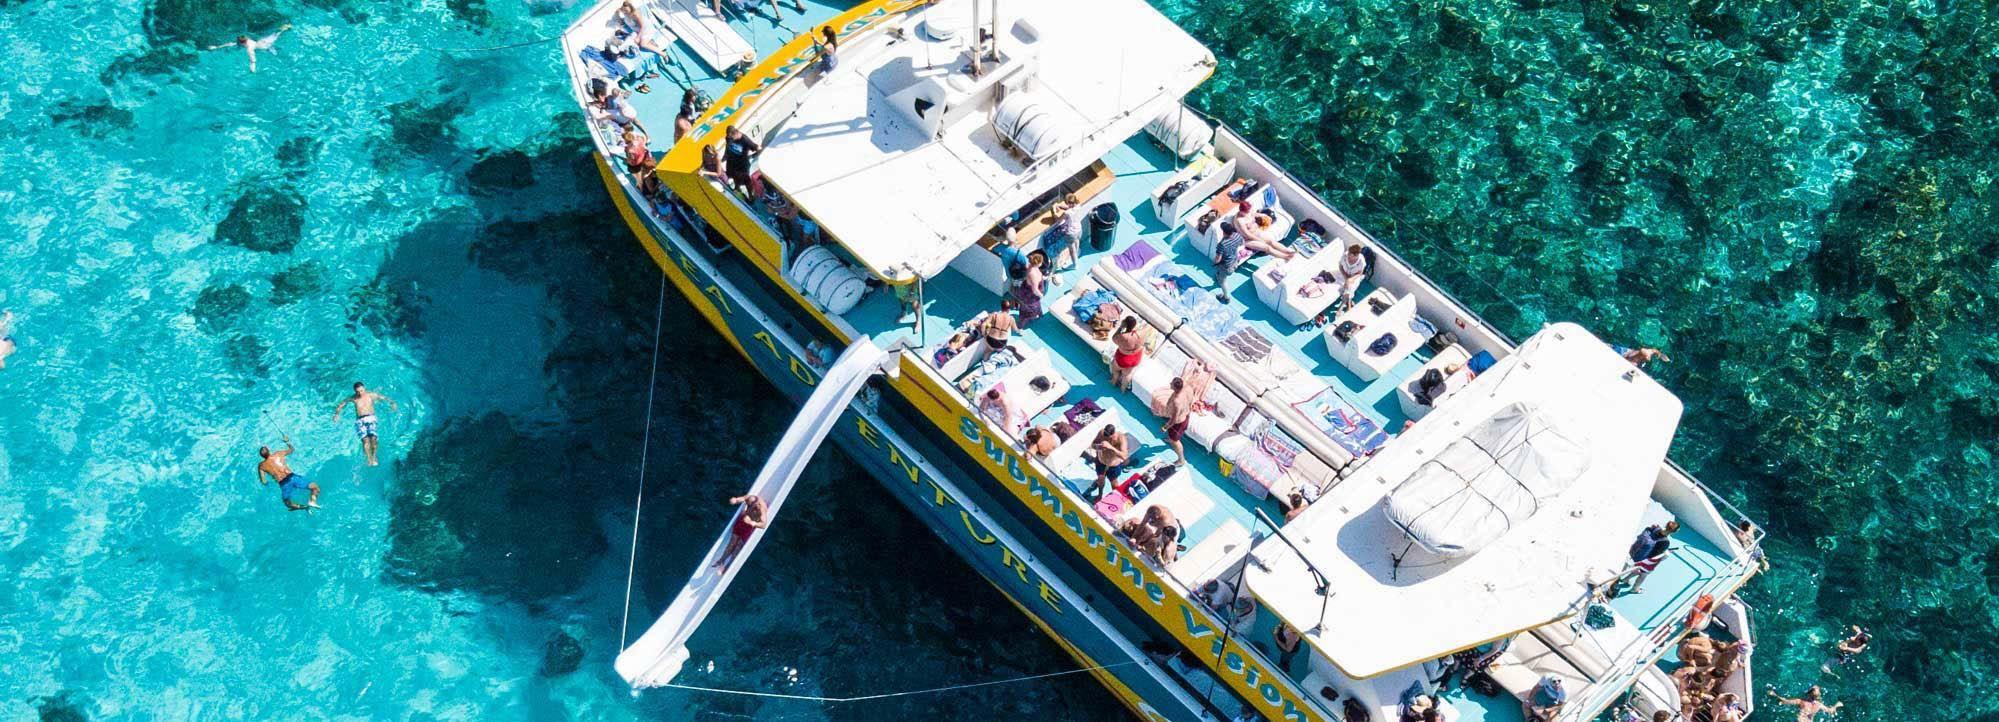 Comino: Blaue Lagune, Kristall-Lagune & Meereshöhlen-Tour